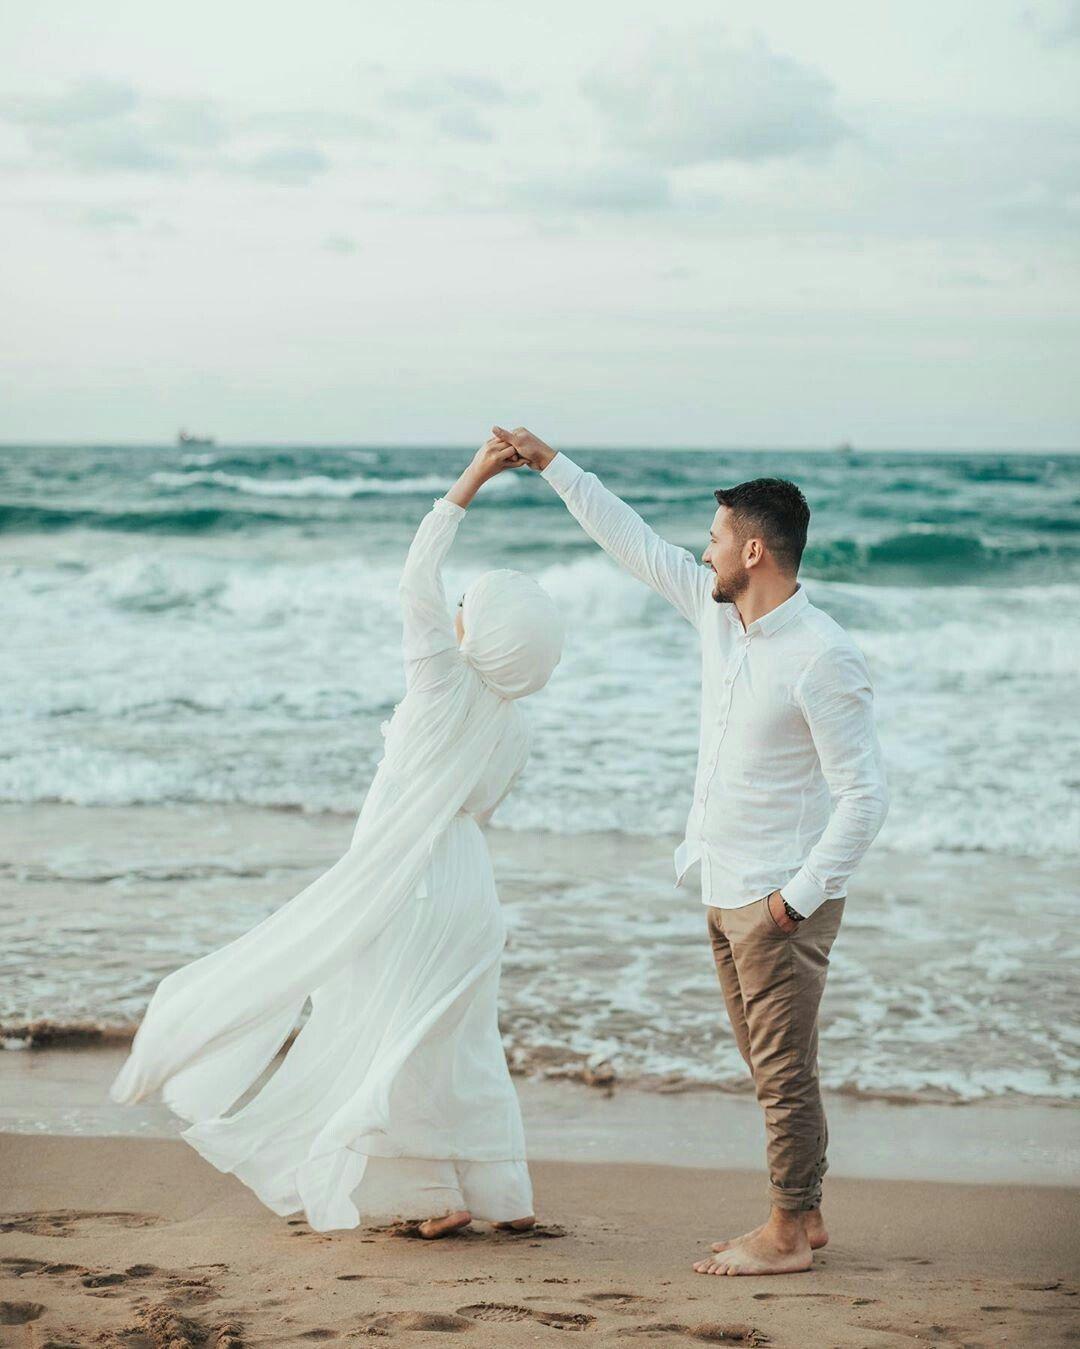 Amreen Ali 1002 In 2020 Muslim Couple Photography Muslim Couples Couple Photography